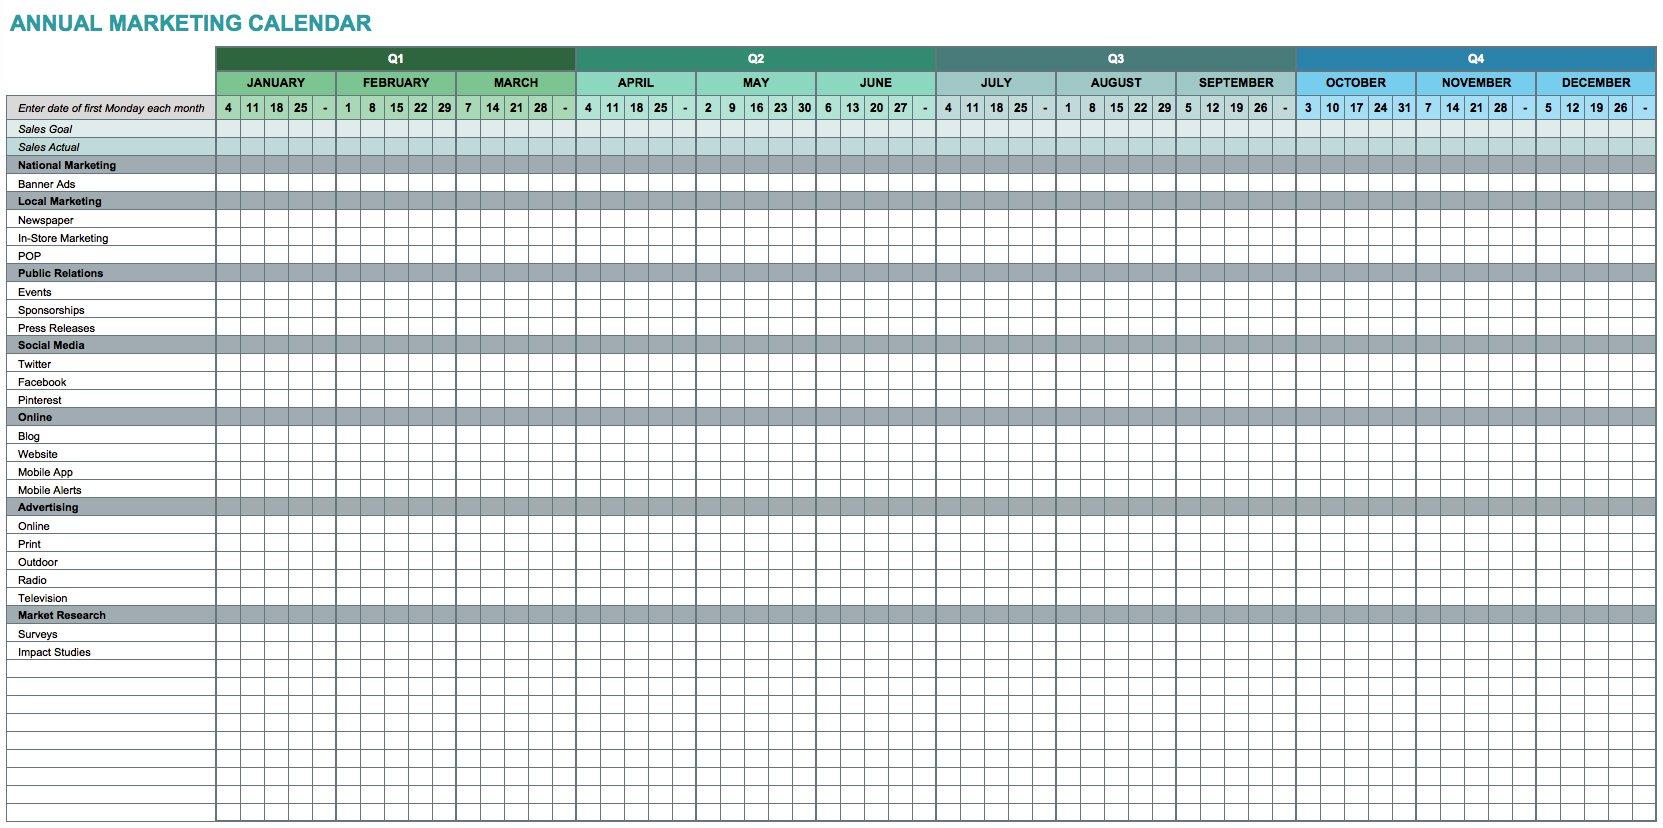 9 Free Marketing Calendar Templates For Excel - Smartsheet within Planning Calendar Template Excel